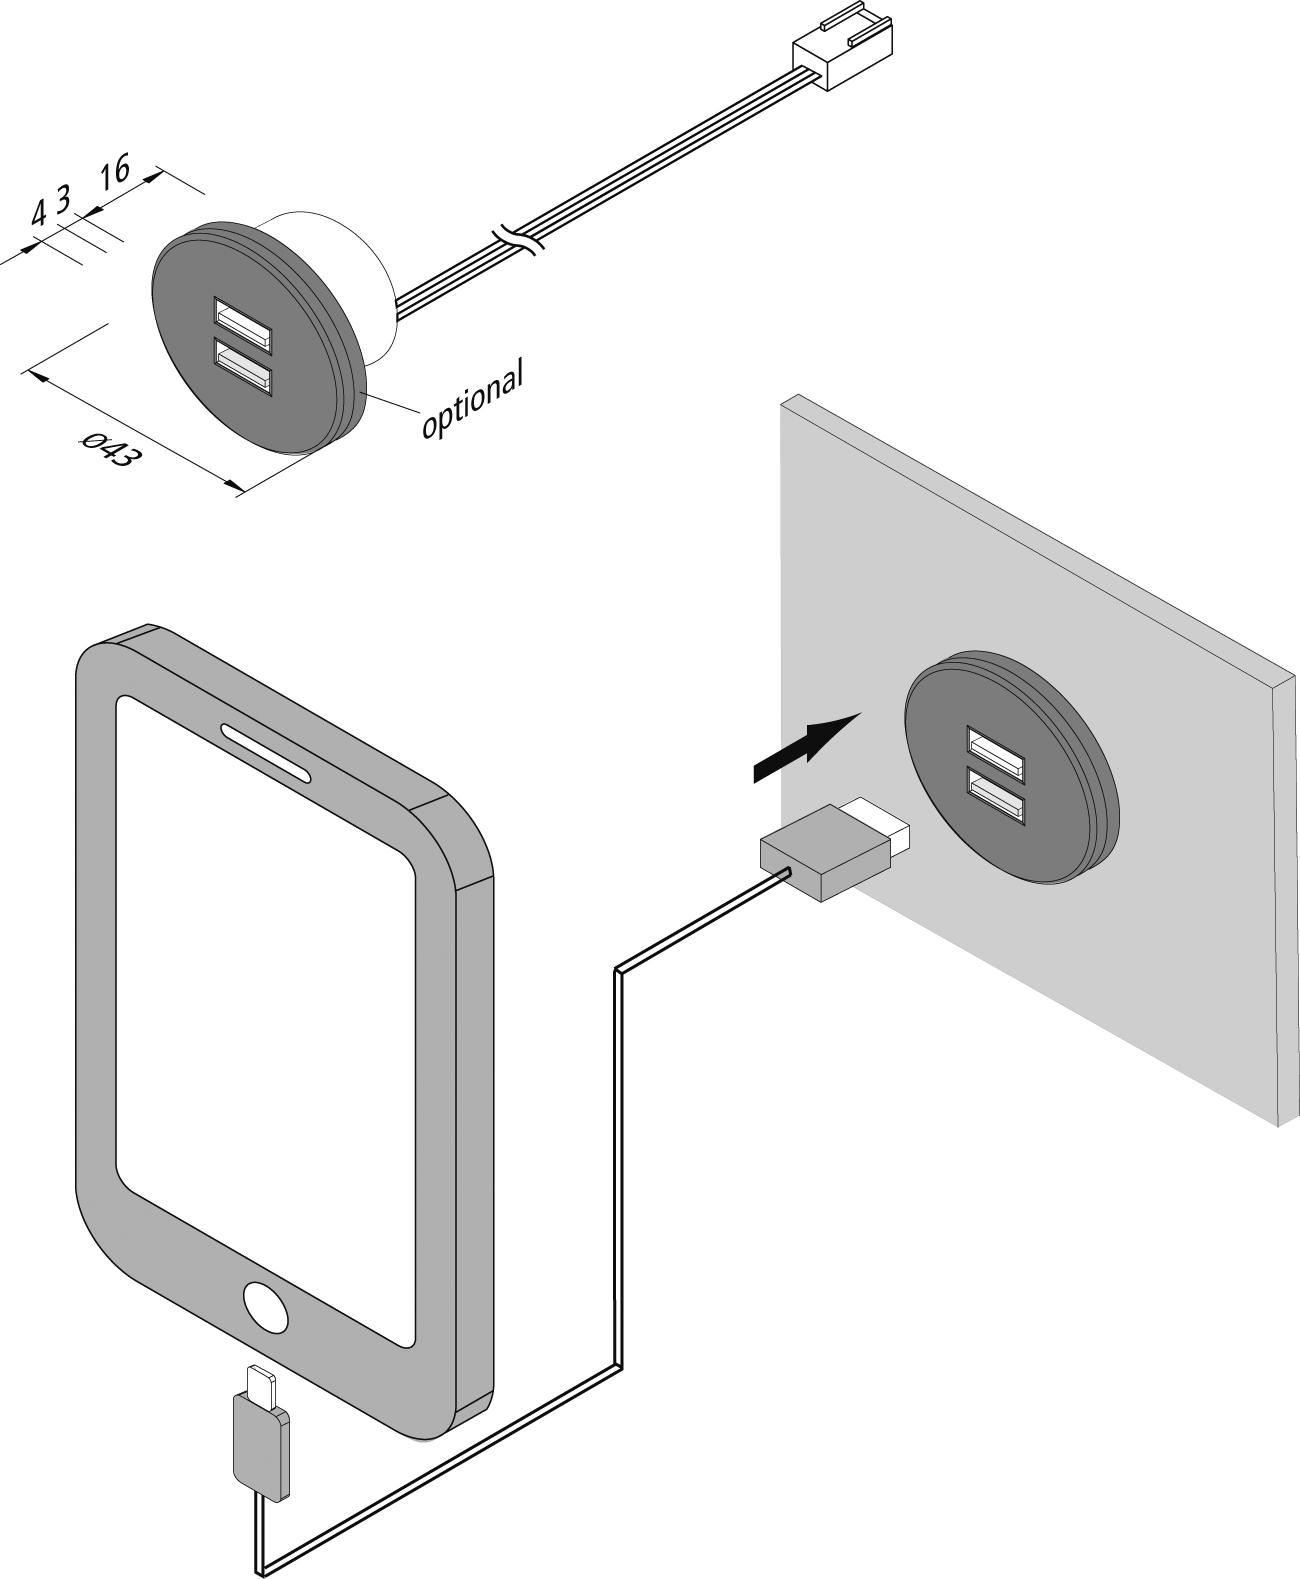 Vorschau: USB-Doppelsteckdose_de